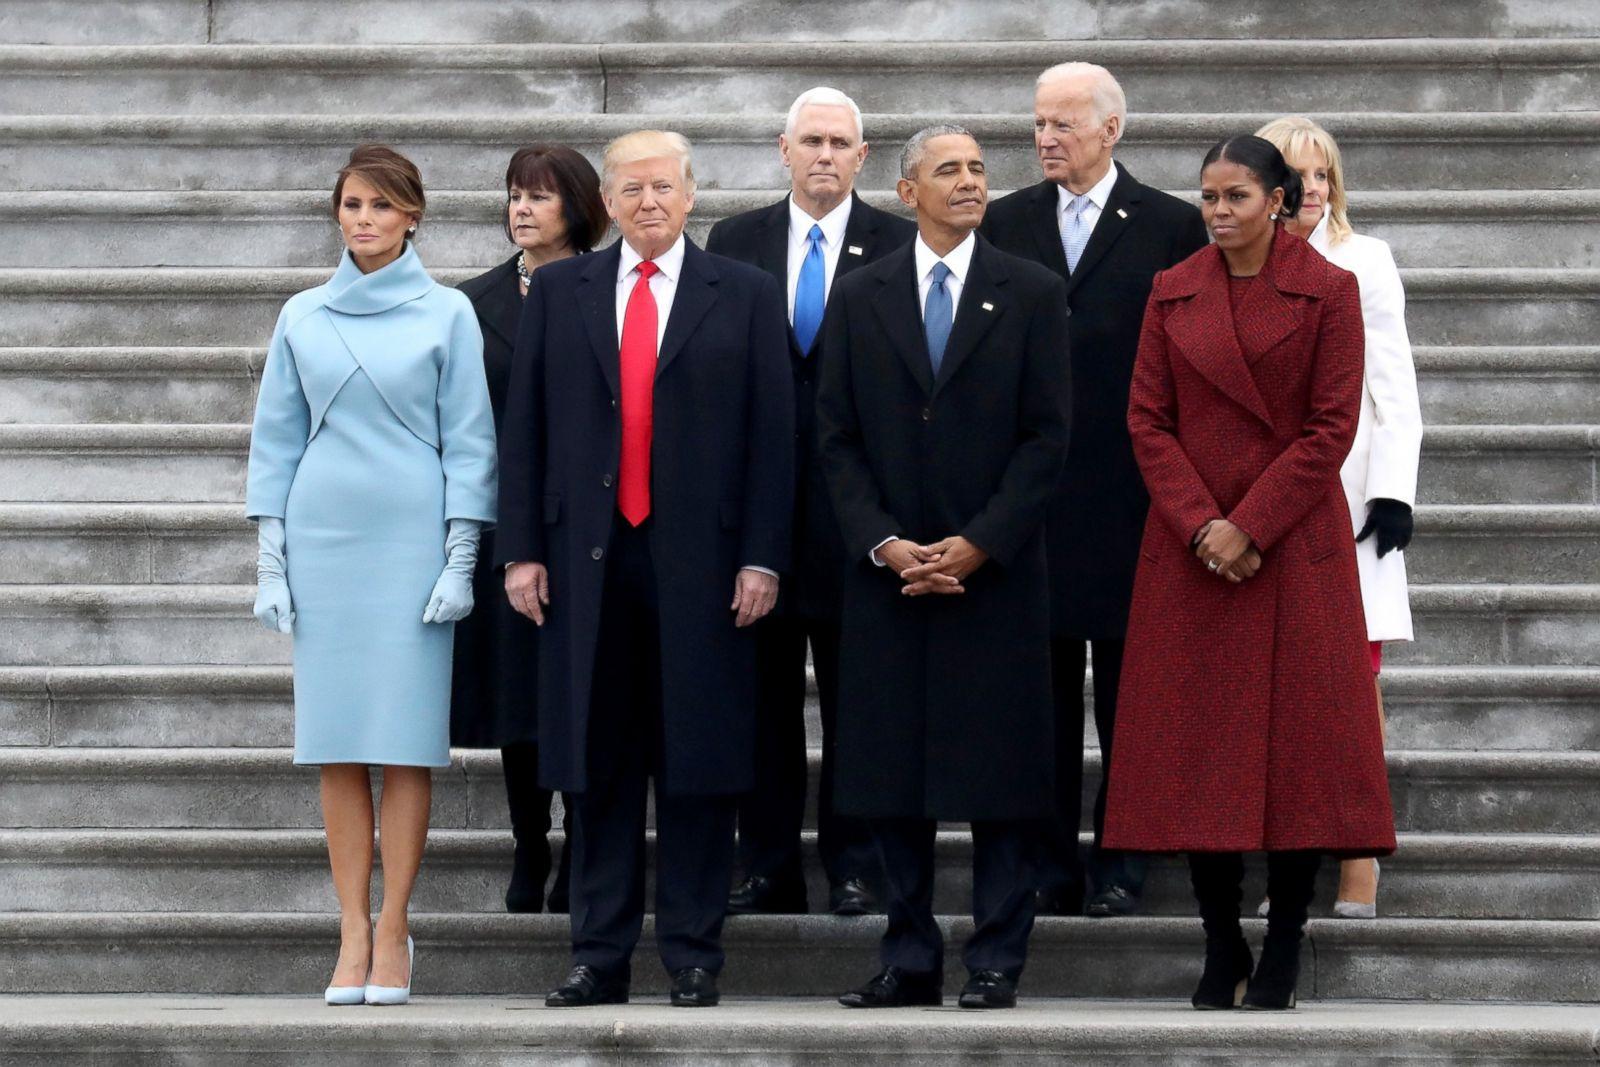 Donald Trumps Inauguration In Photos Photos Abc News